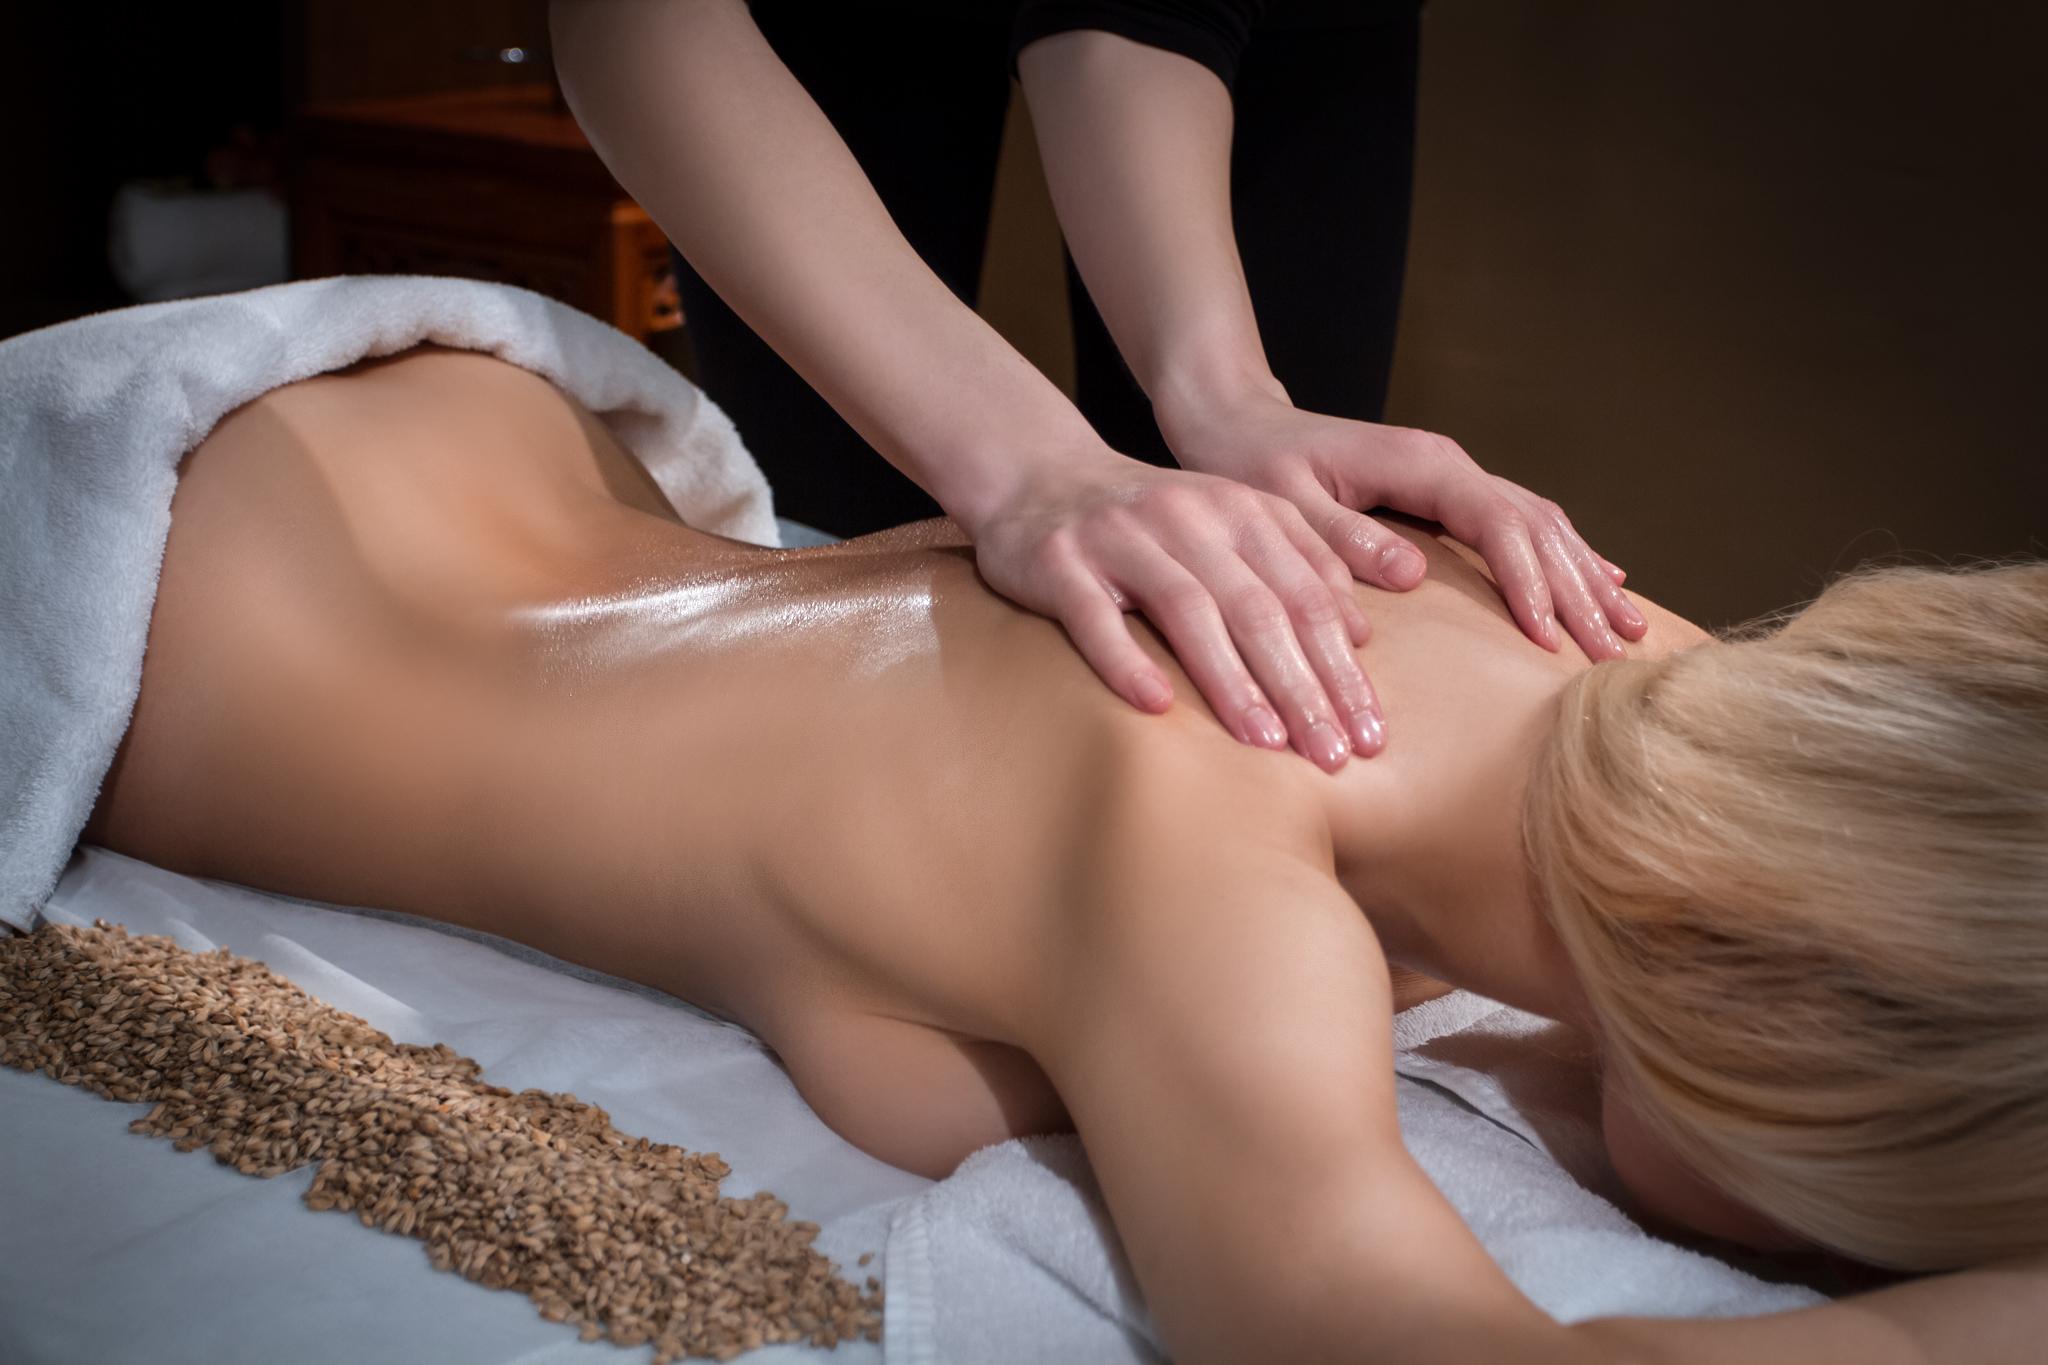 Kittyblanco, erotic therapeutic ts escort massage, providence, ri